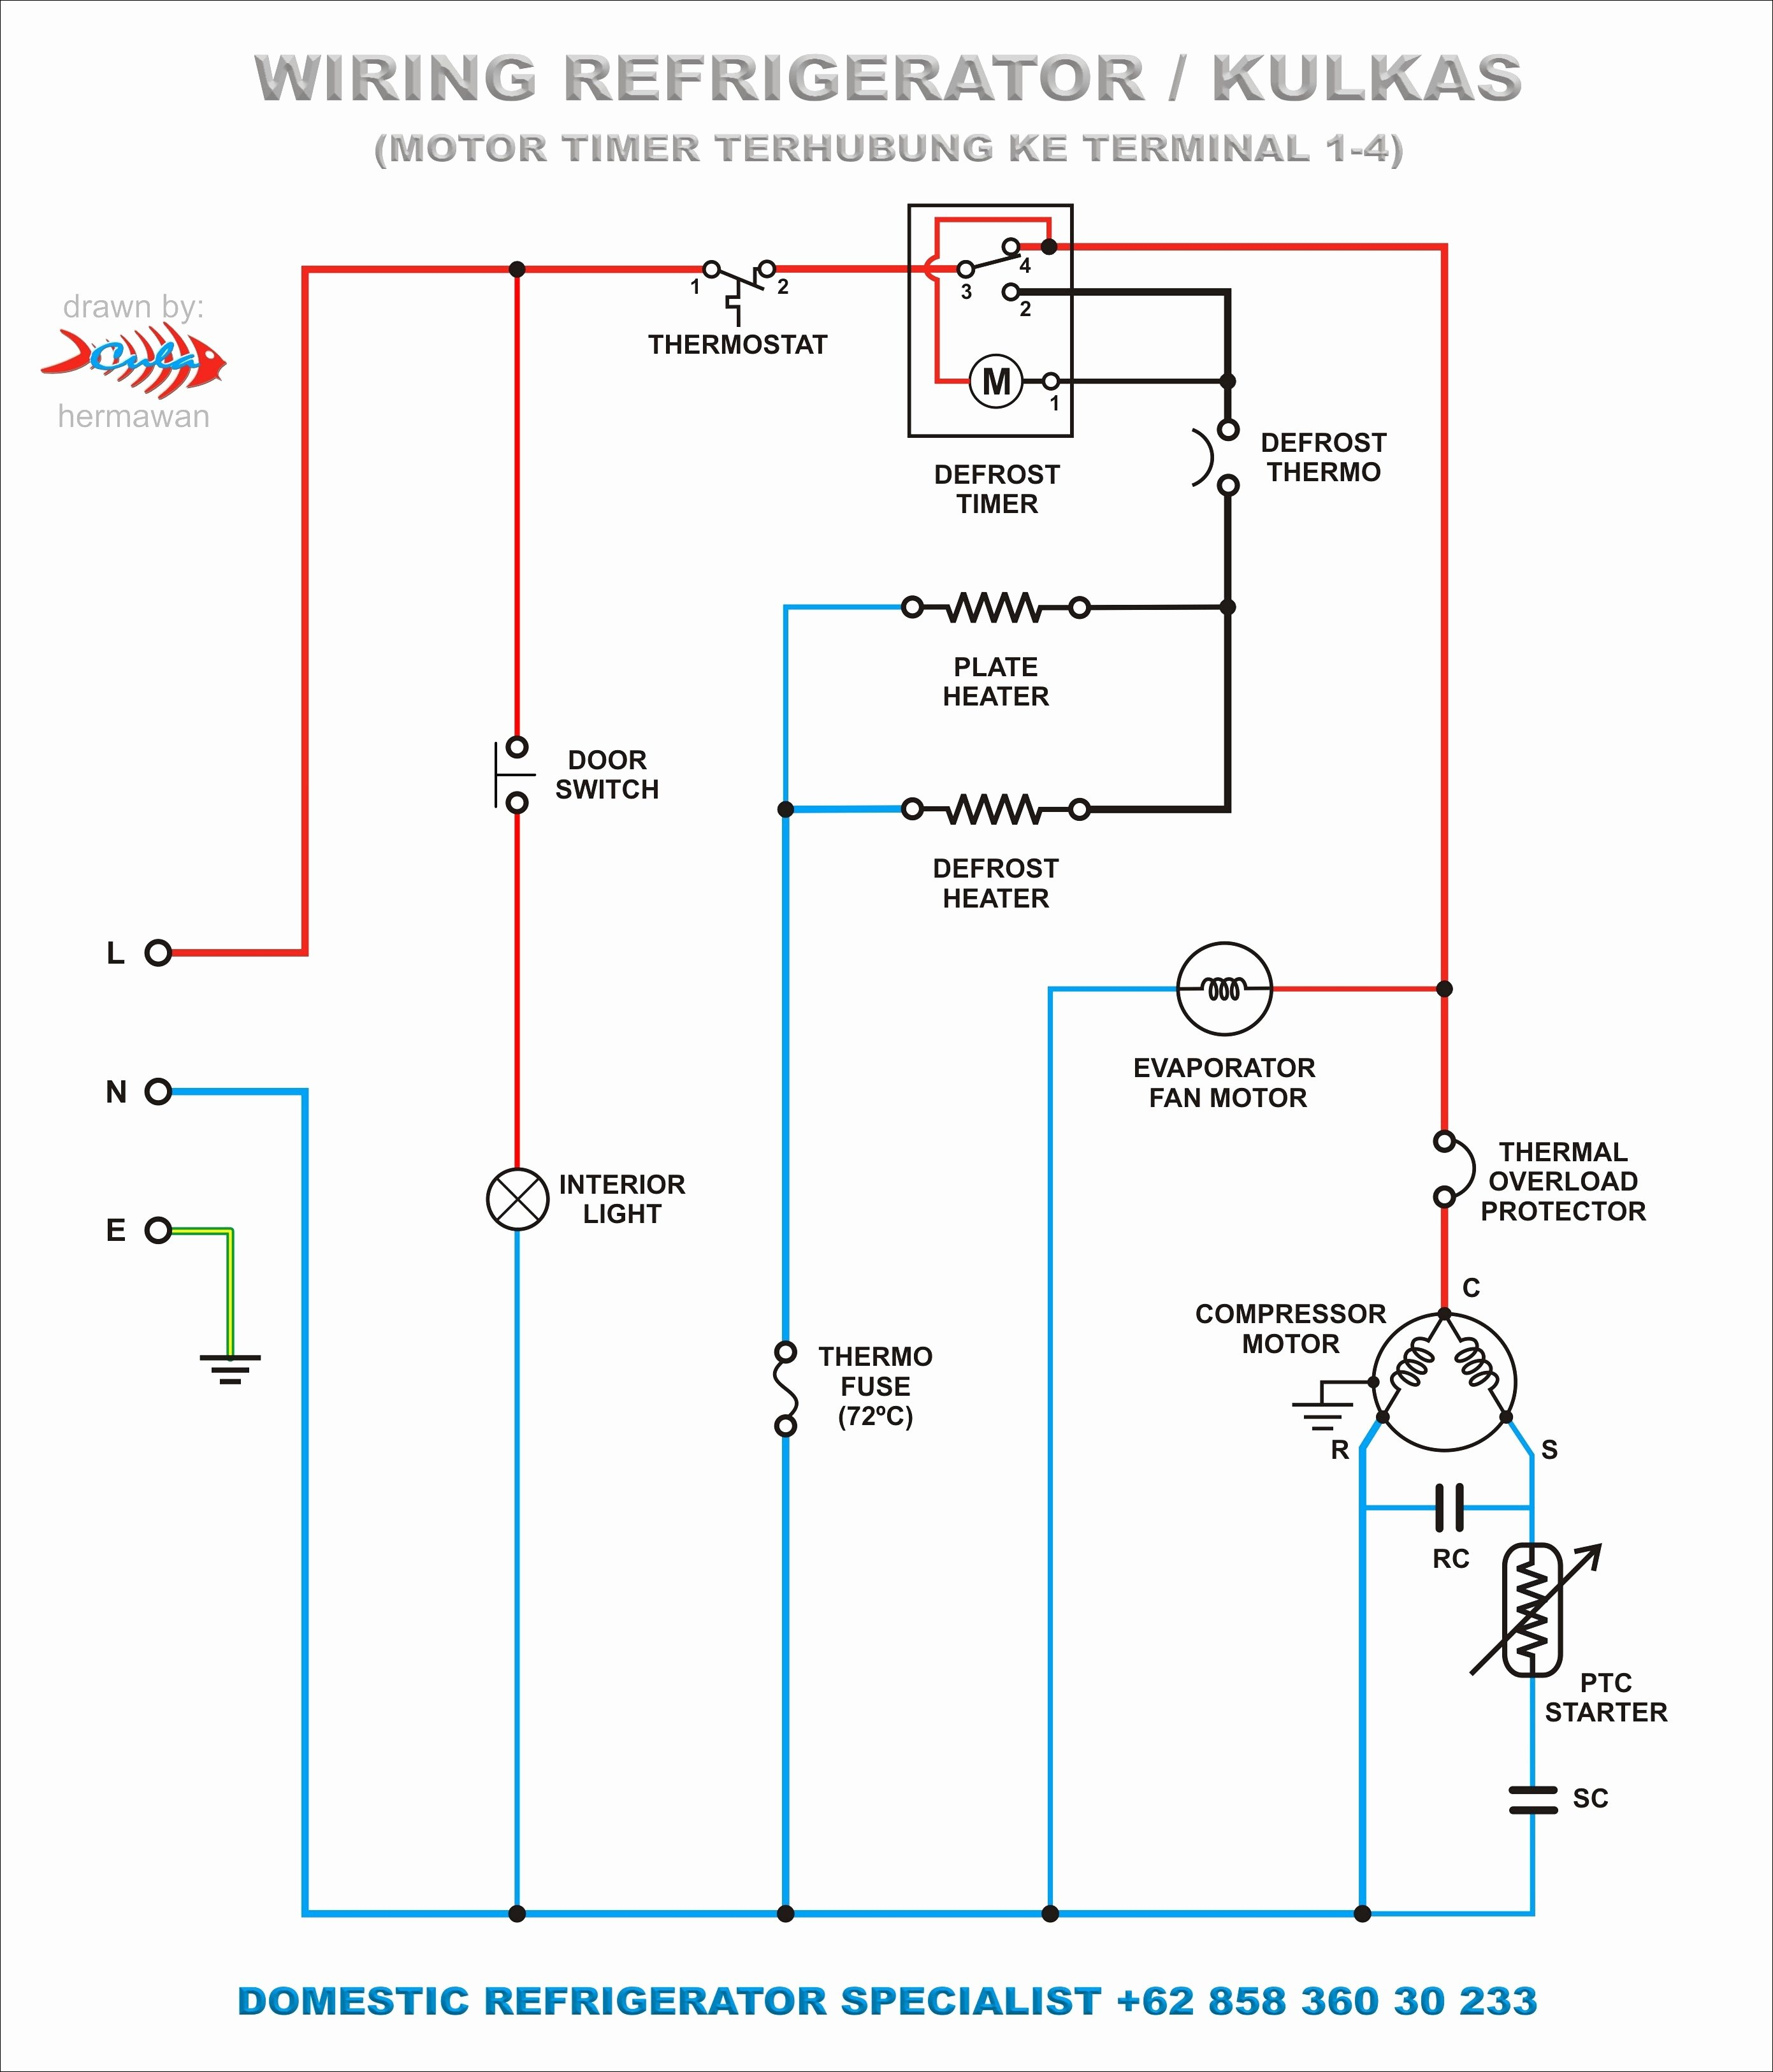 Pioneer Deh X6700Bt Wiring Diagram Inspirational Pioneer Deh X6700Bt - Pioneer Deh-X6700Bt Wiring Diagram